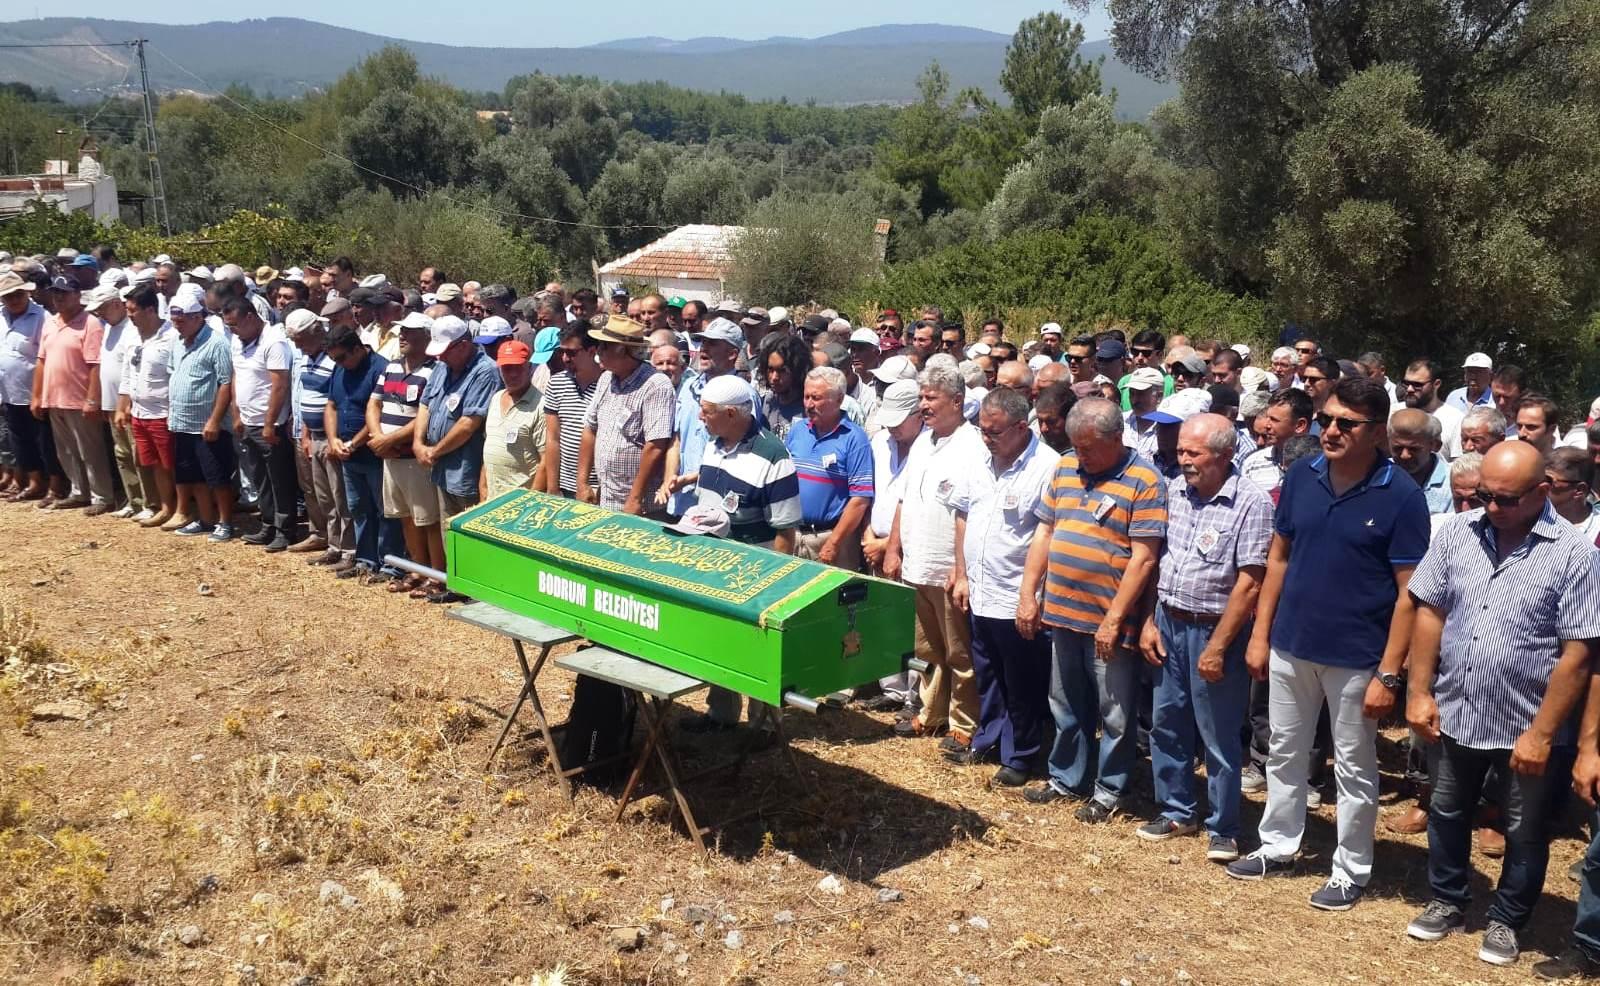 durmuş ali cangır DURMUŞ ALİ CANGIR SON YOLCULUĞUNA UĞURLANDI… durmus ali cangir cenaze t  reni 1